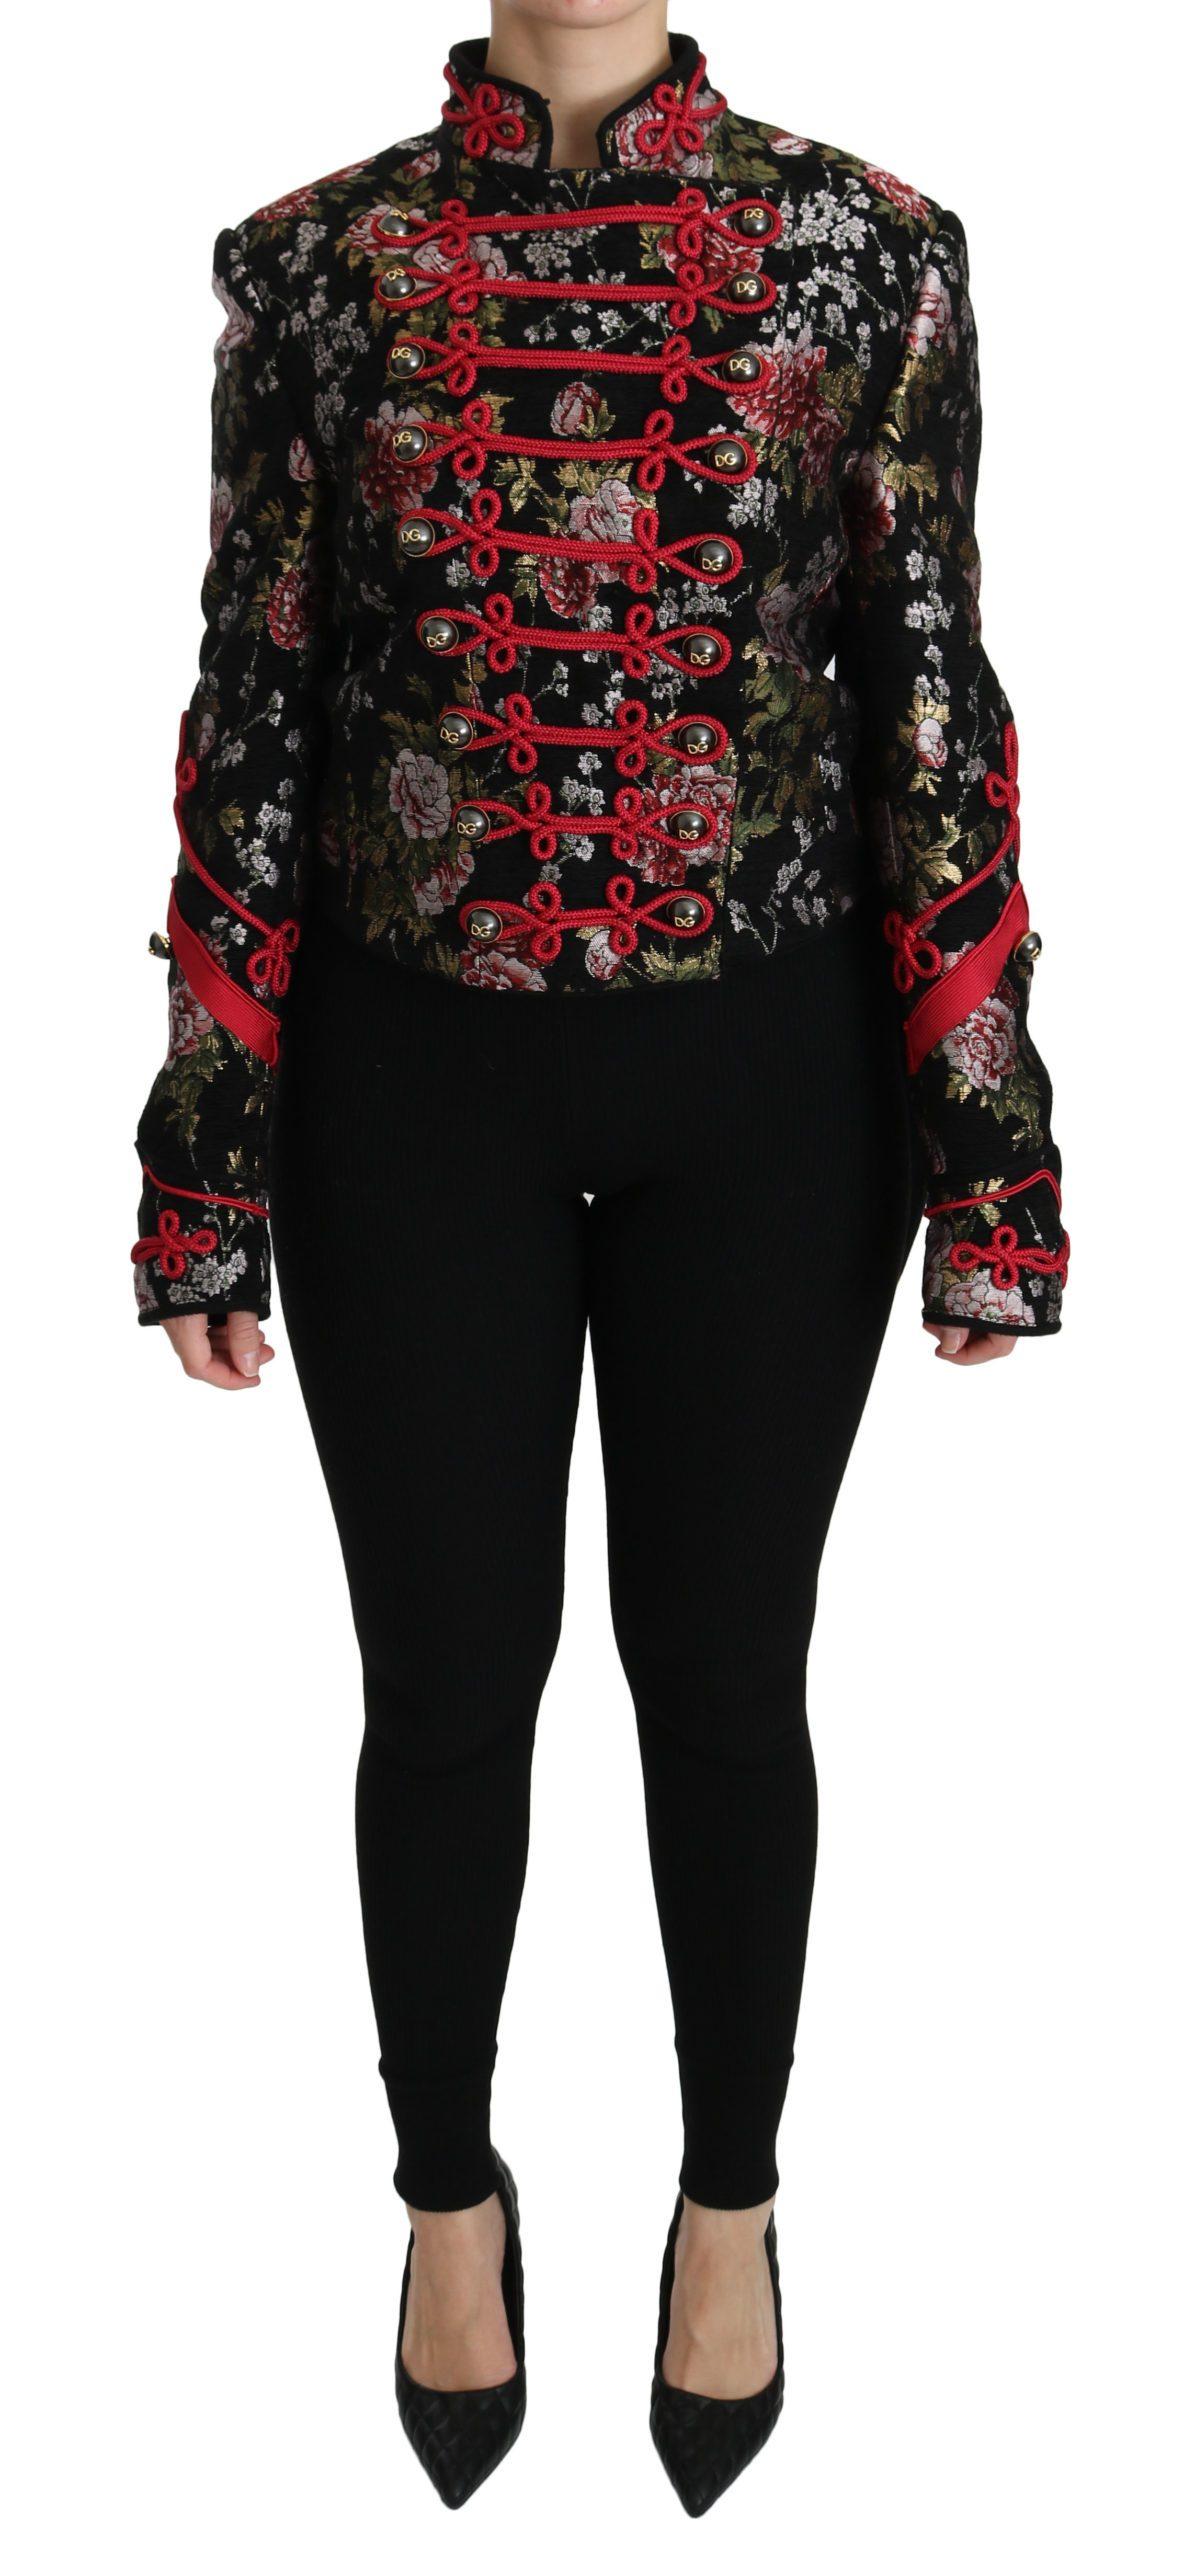 Dolce & Gabbana Women's Floral Print Jacquard Jacket Black JKT2491 - IT40|S